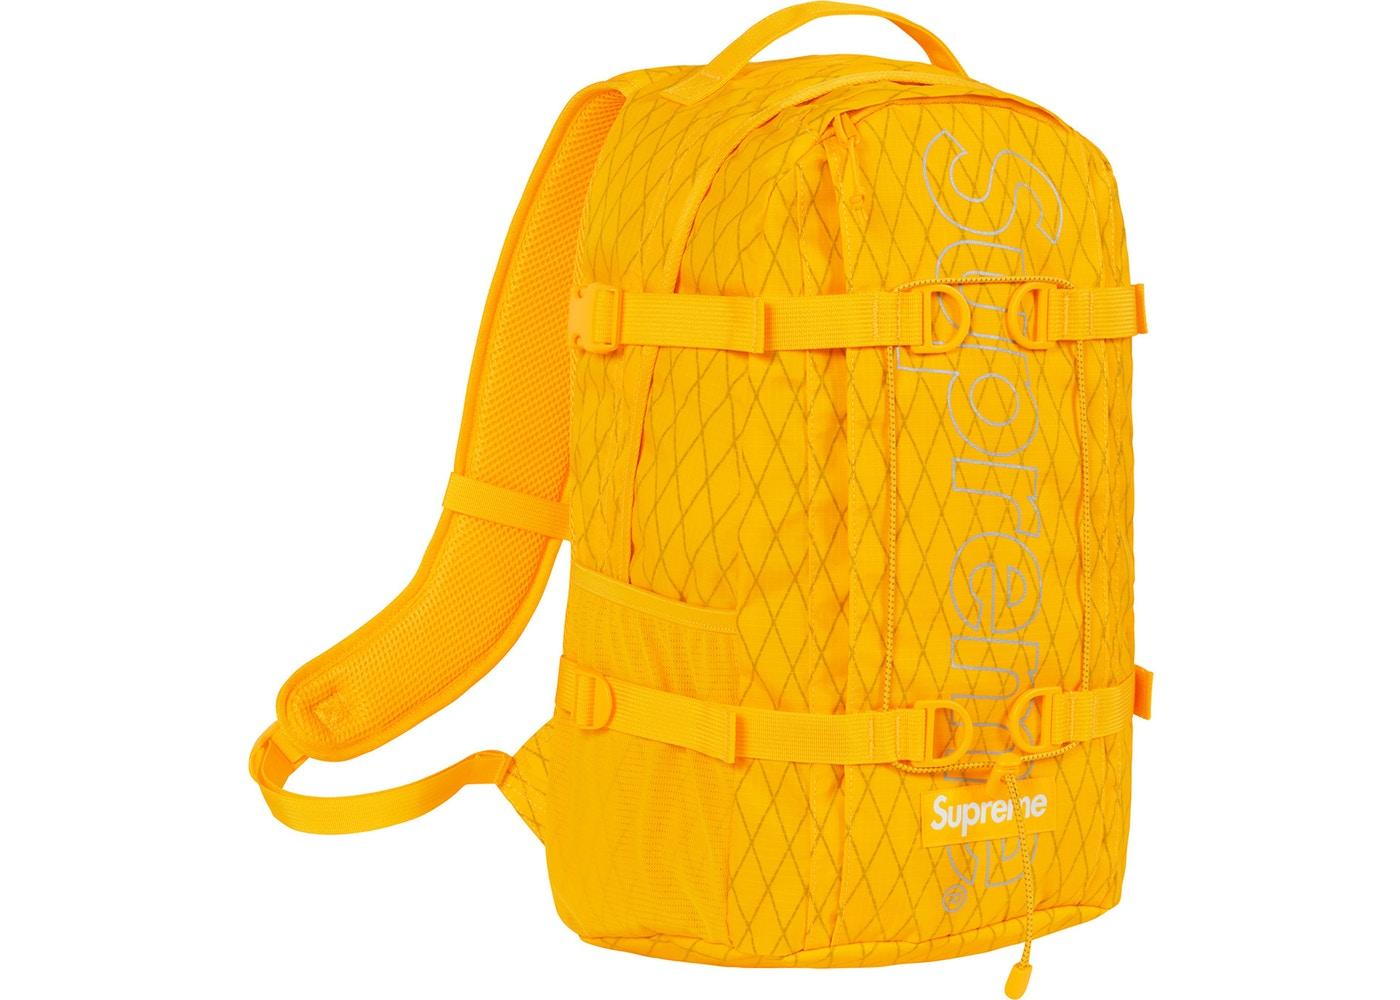 88f1d5fd Supreme Fw18 Shoulder Bag Stockx | City of Kenmore, Washington